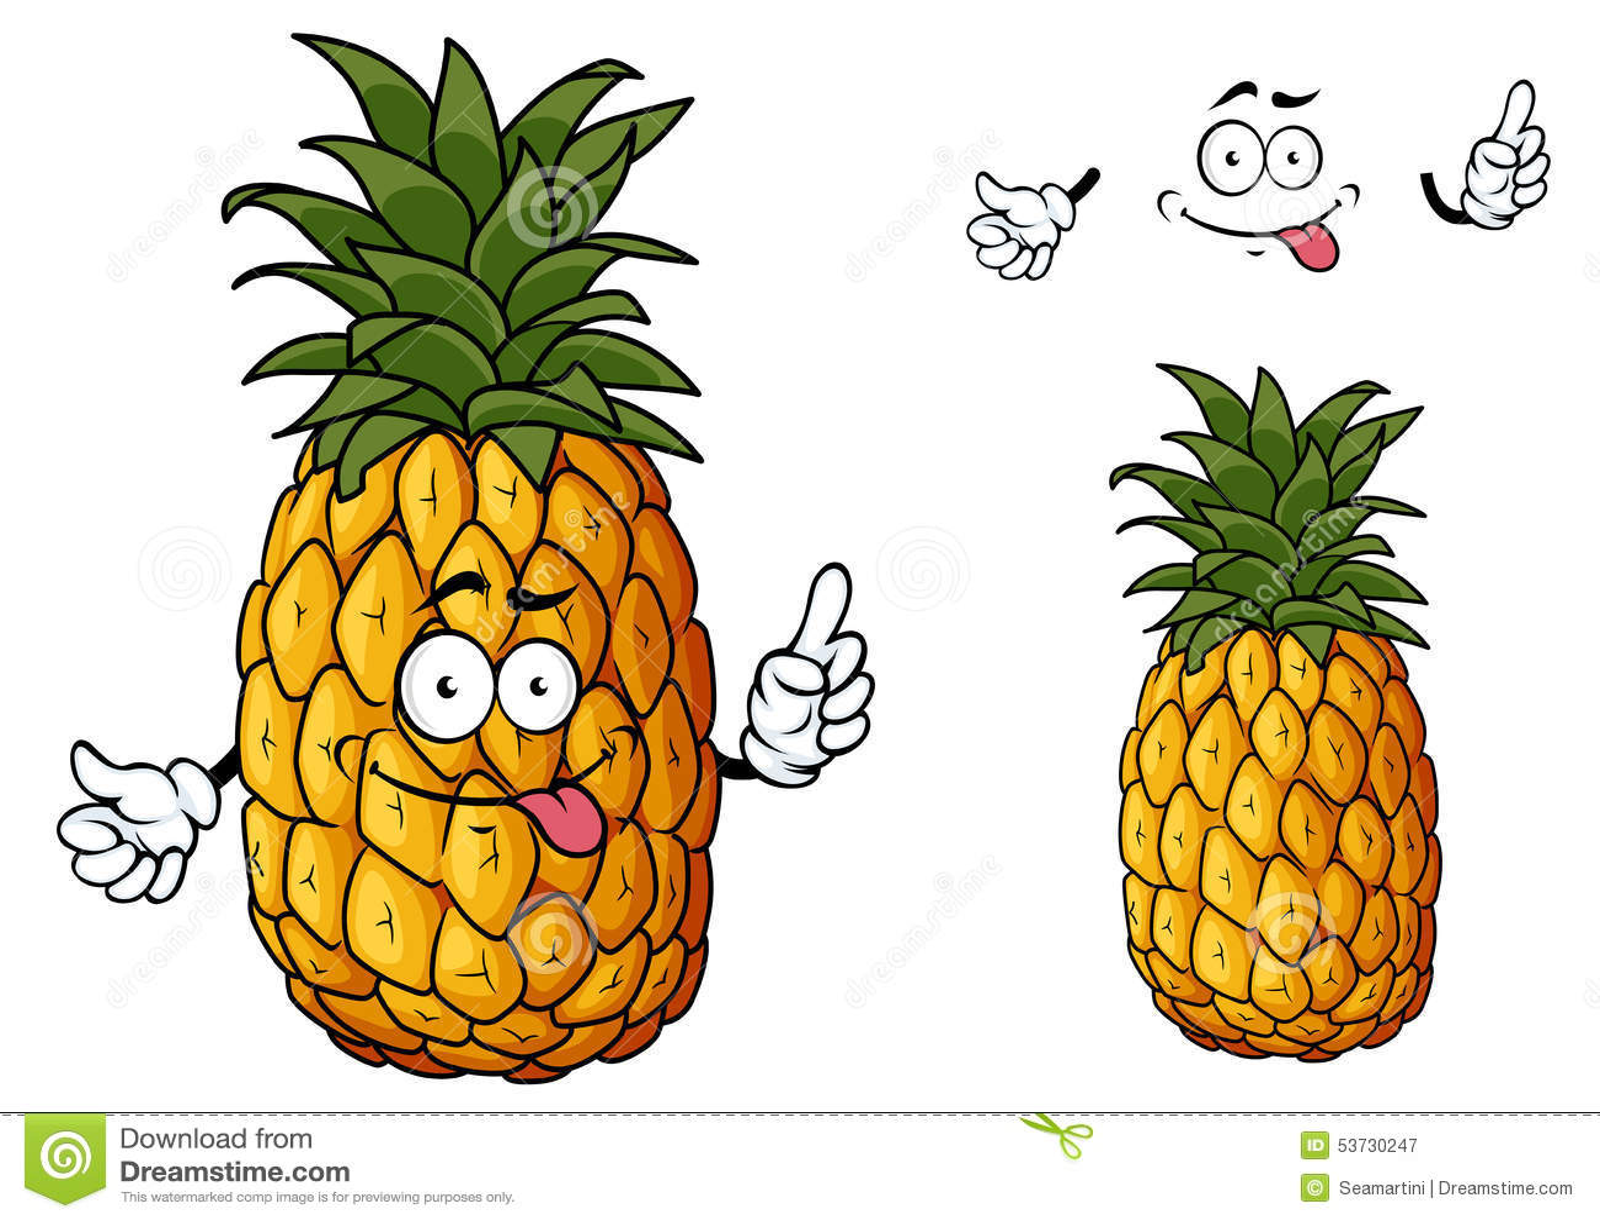 ... Cartoon Pineapple Fruit Waving A Hand Stock Vector - Image: 53730247